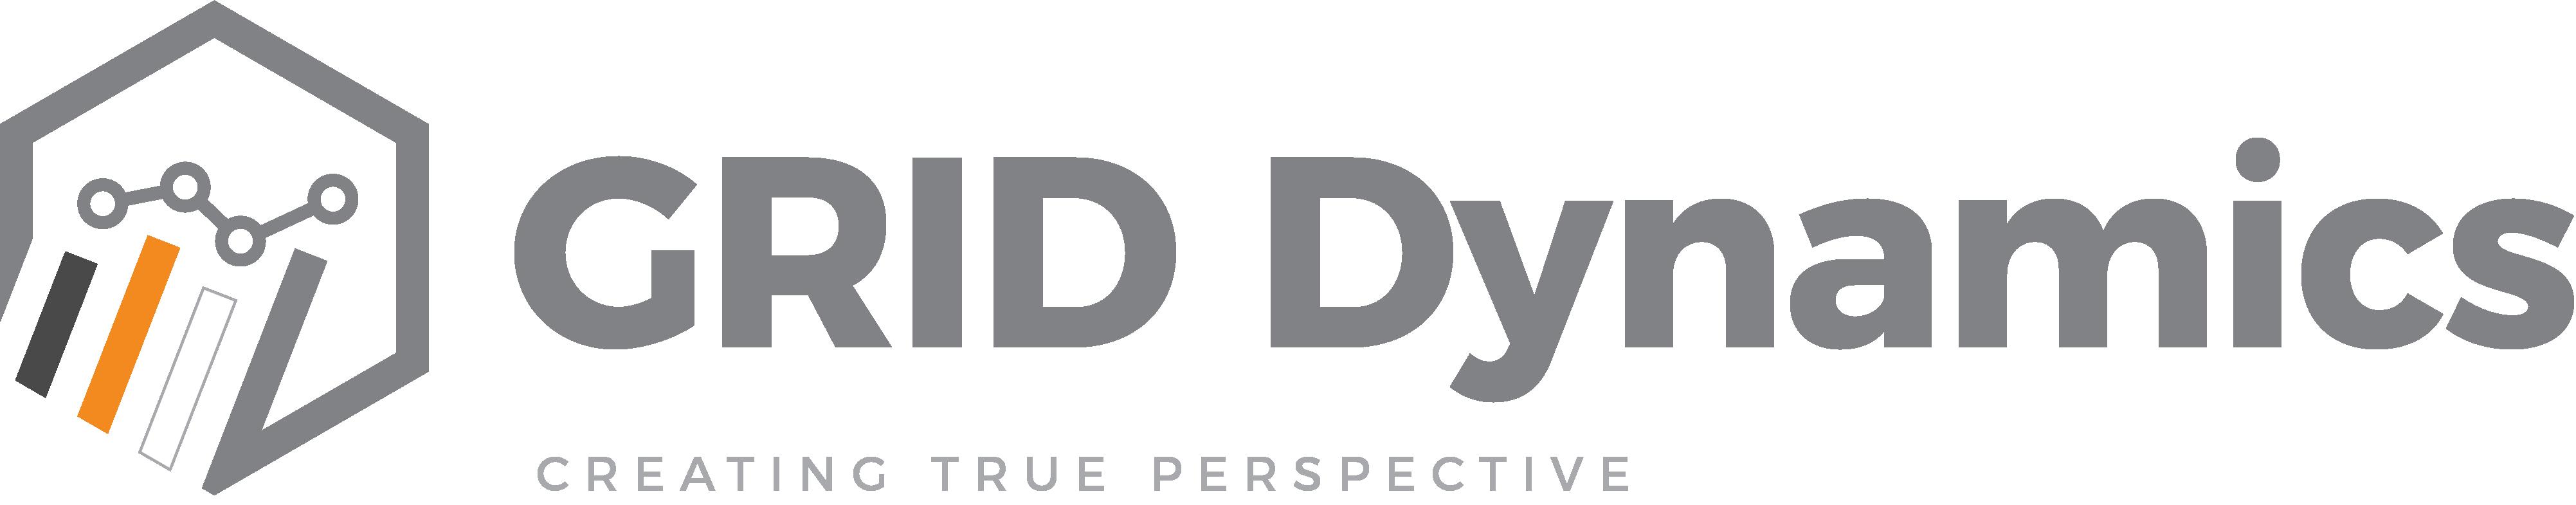 GRID Dynamics Inc.